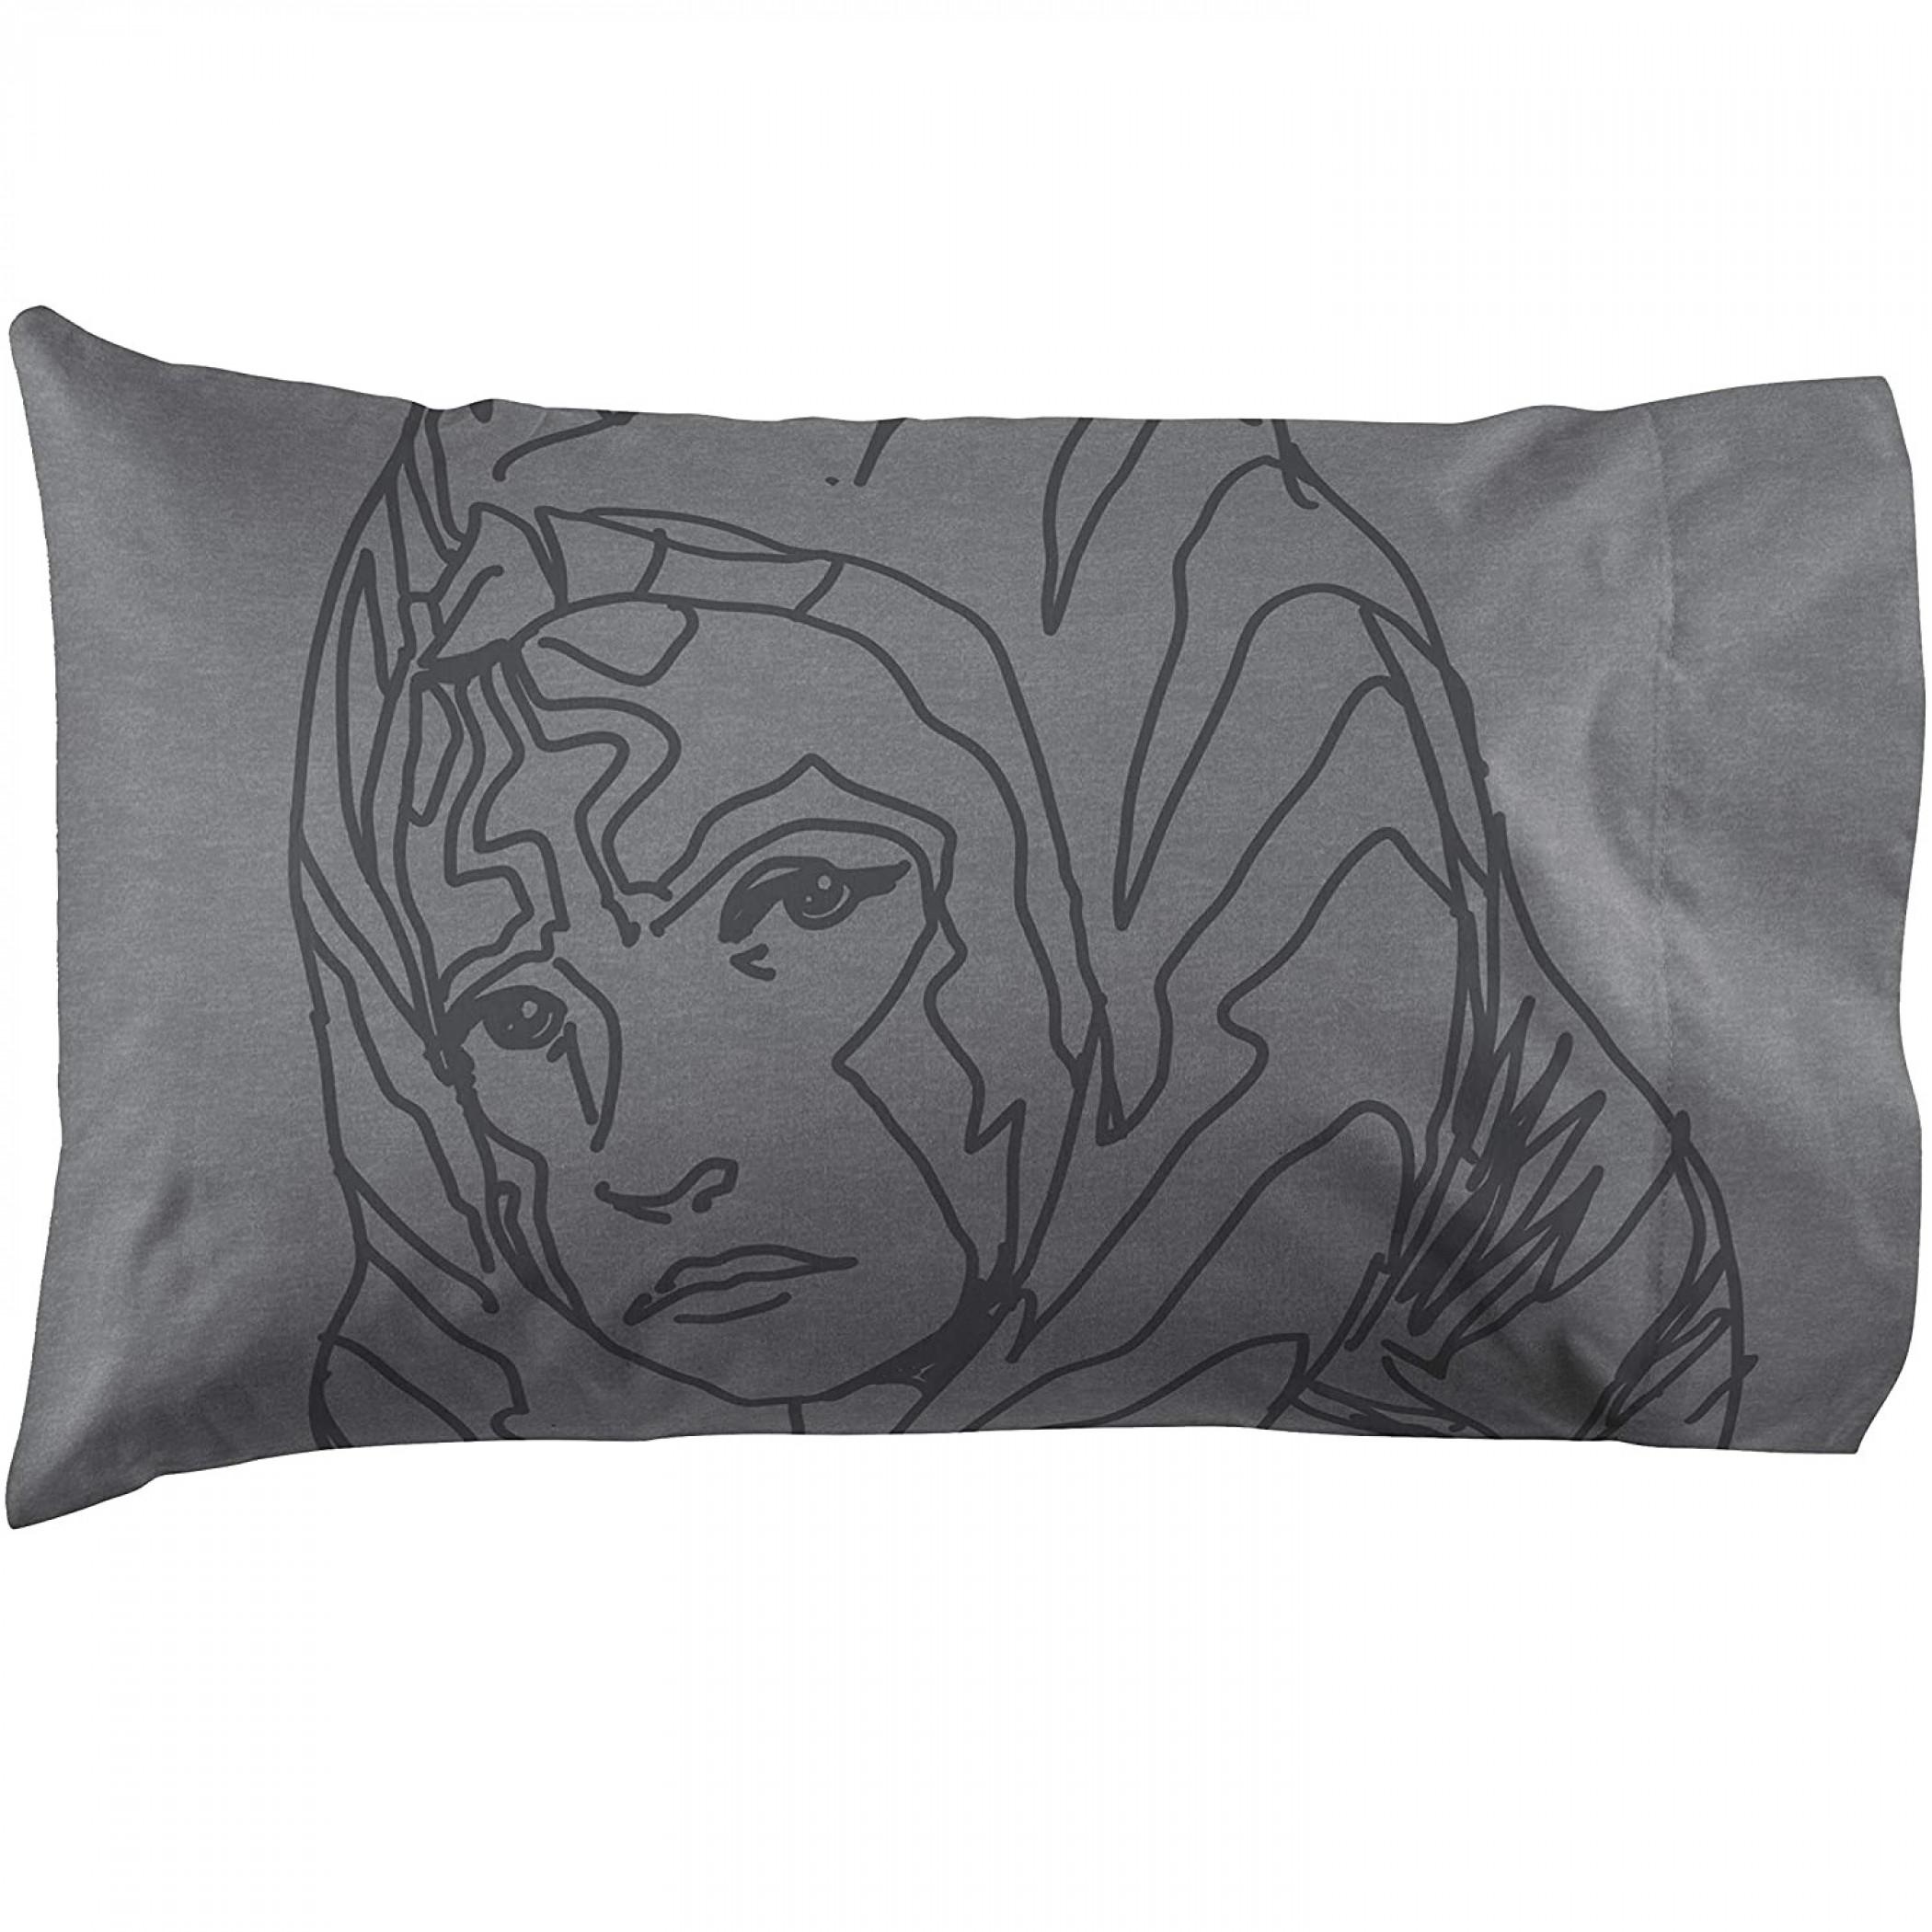 Star Wars Clone Wars Ahsoka Lives Pillowcase